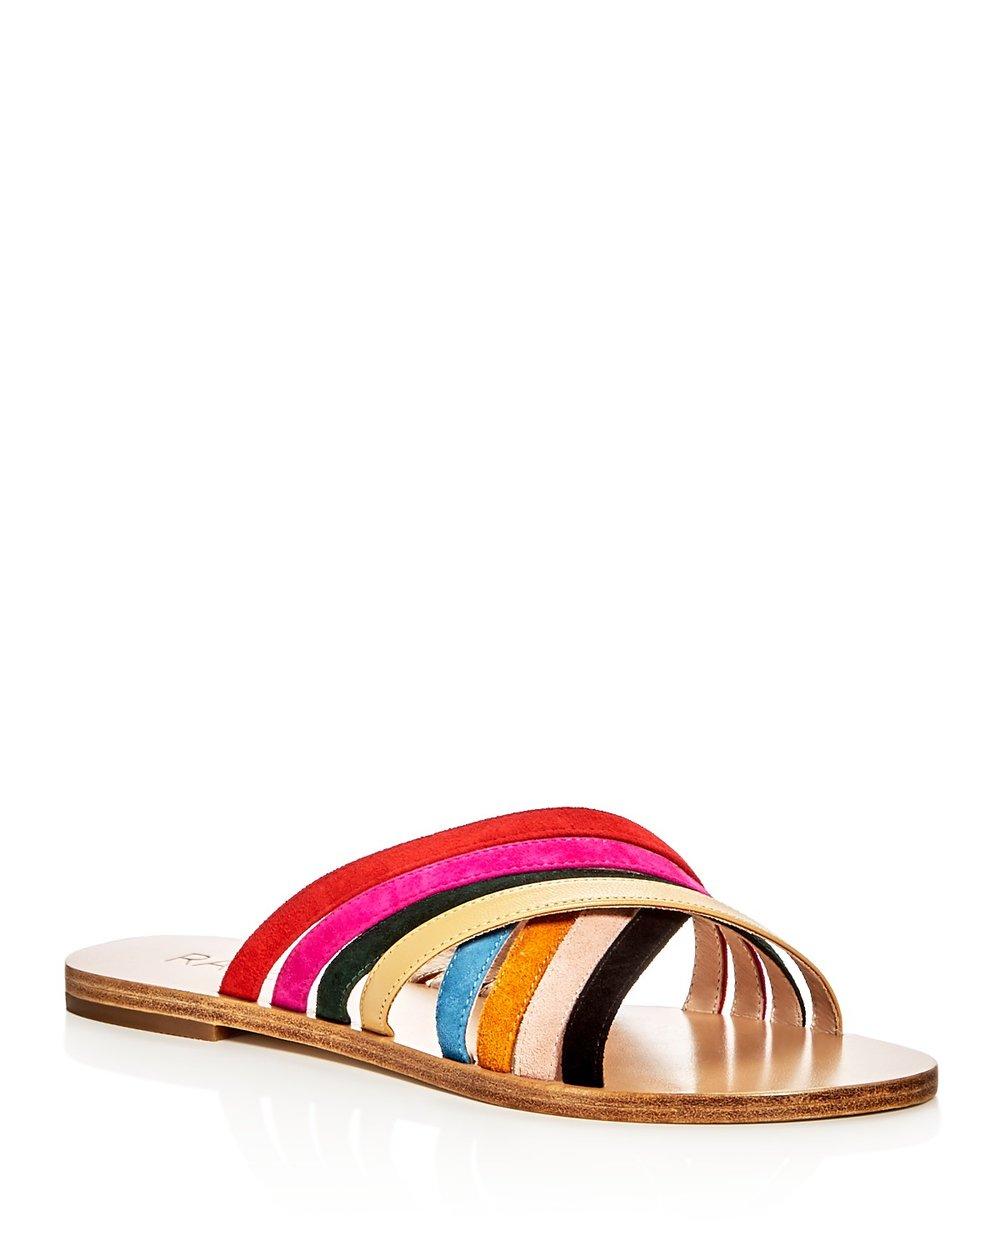 wearyourwholecloset_sandal2.jpeg